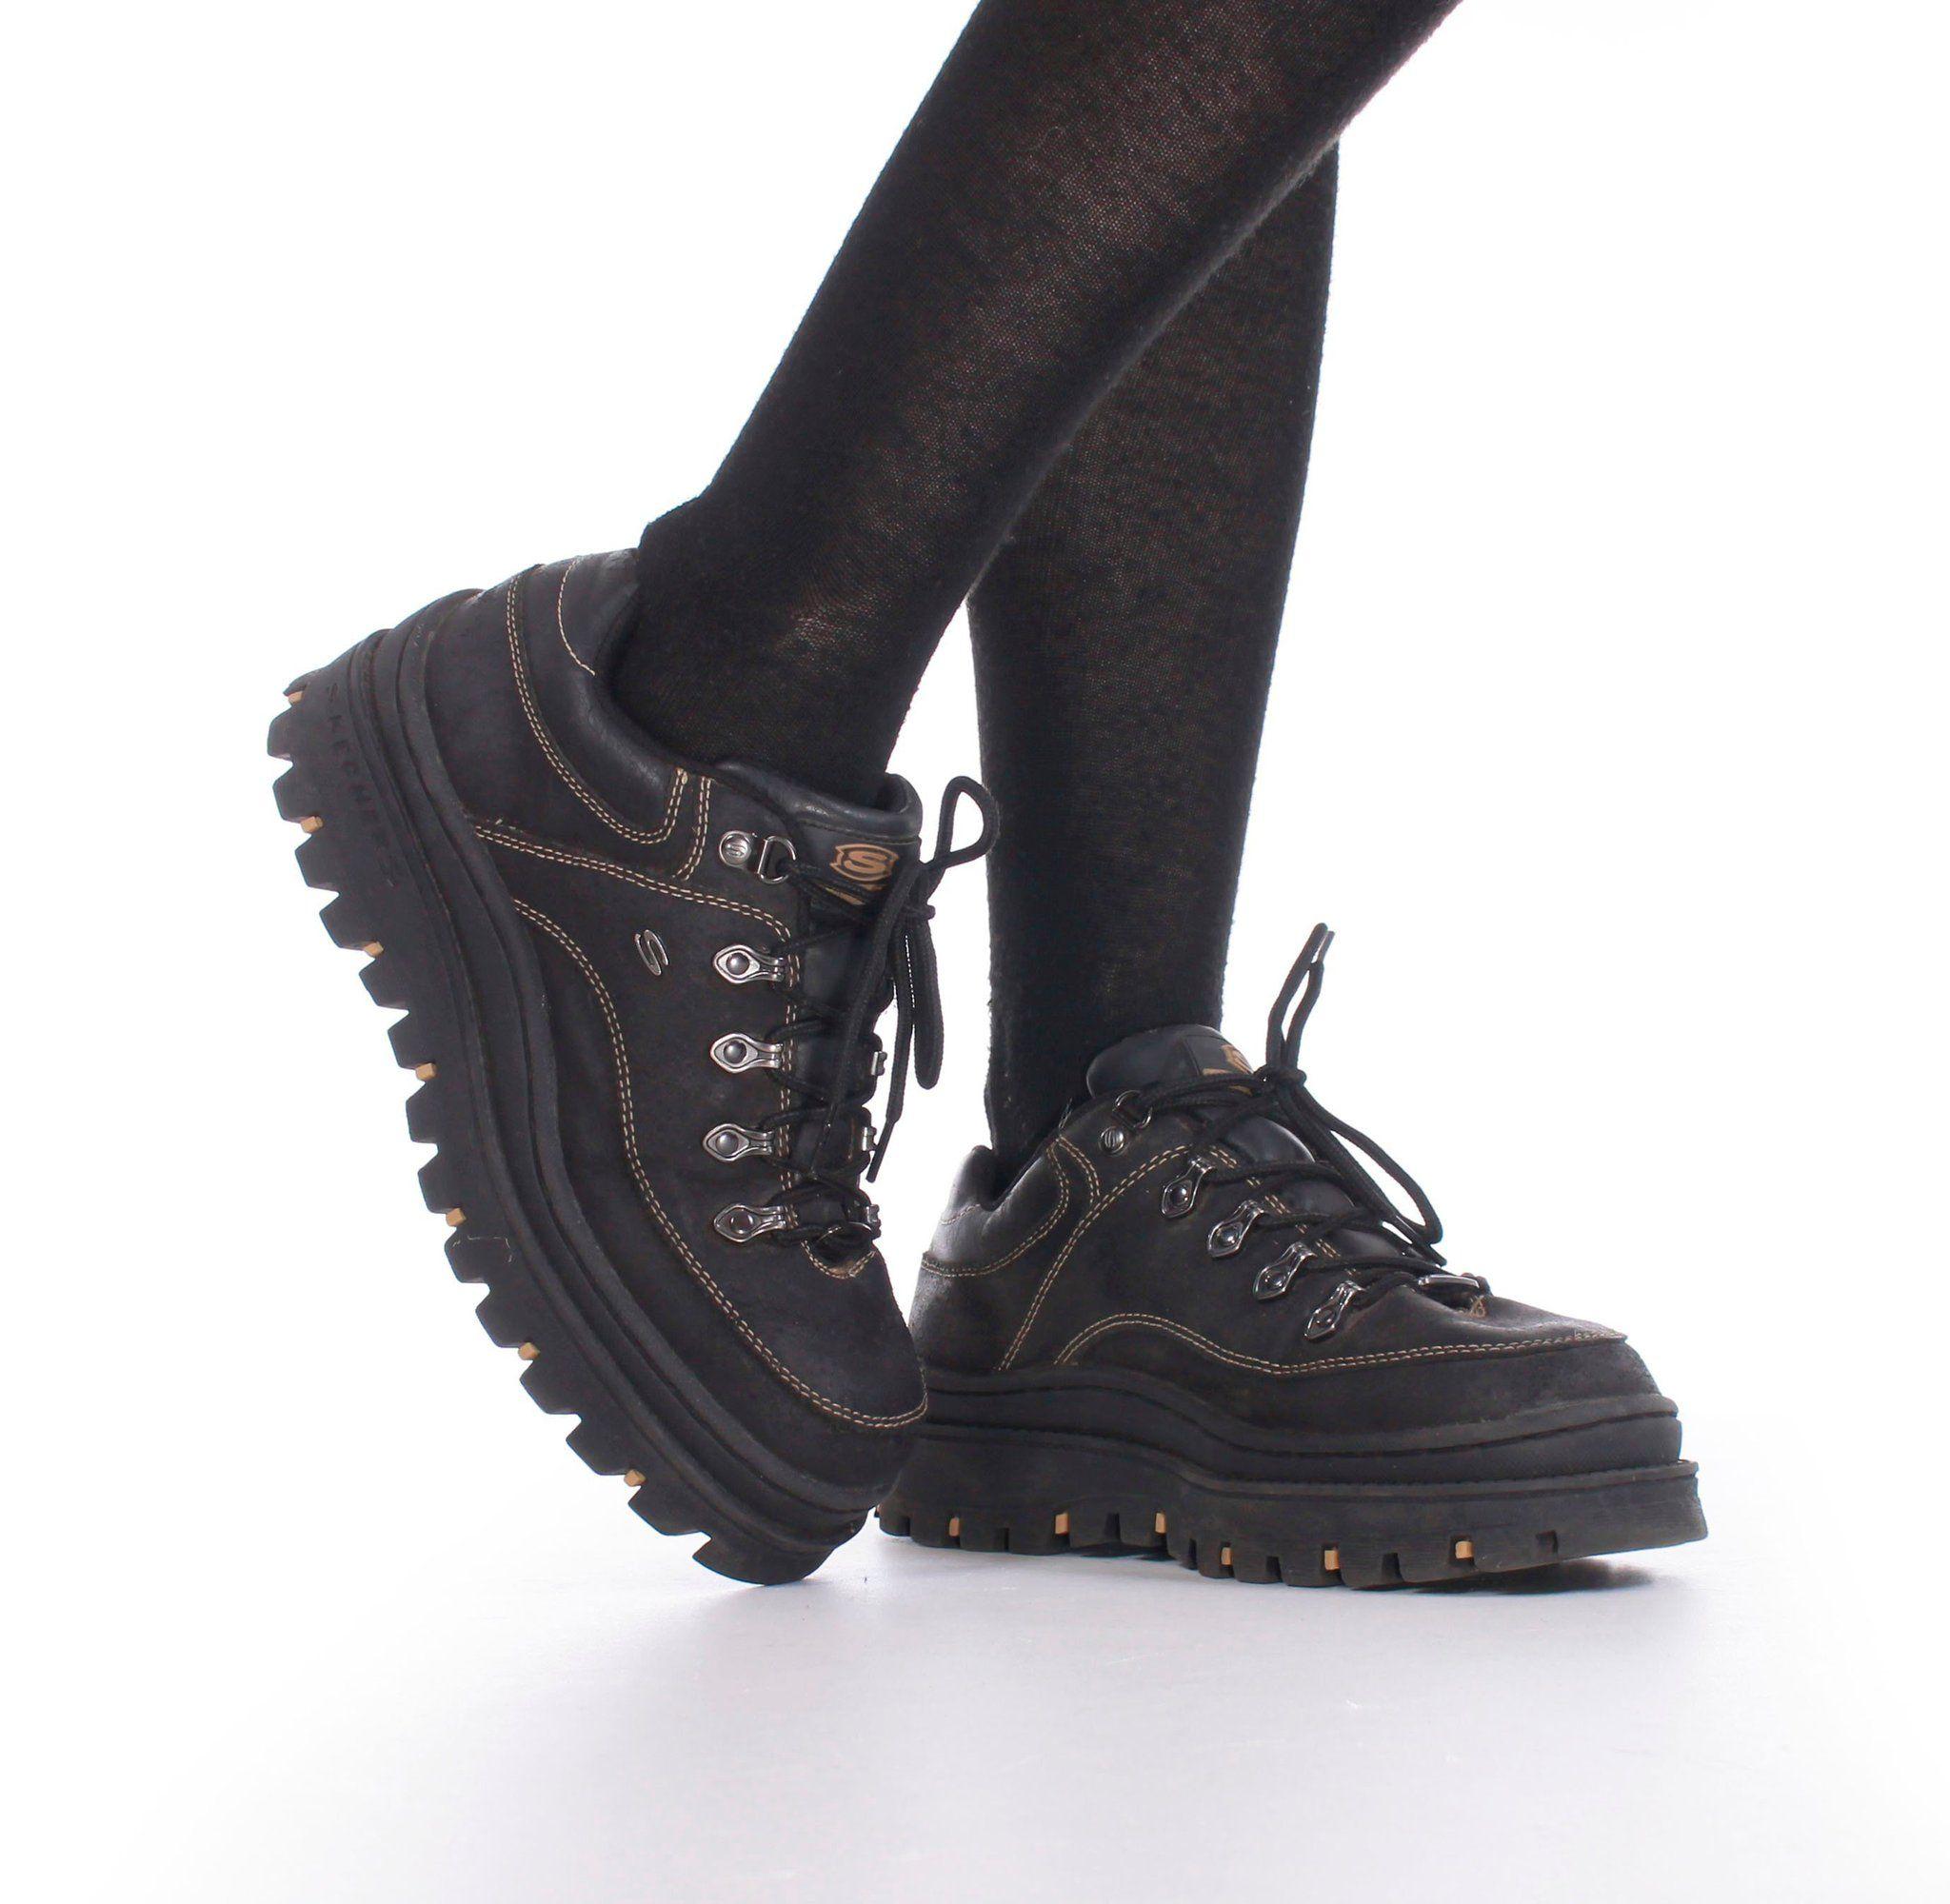 0f7ab089a0bd 90 s Platform Skechers Jammers Boots Women s Size 9.5 – KCO VINTAGE Black  Shoe Polish